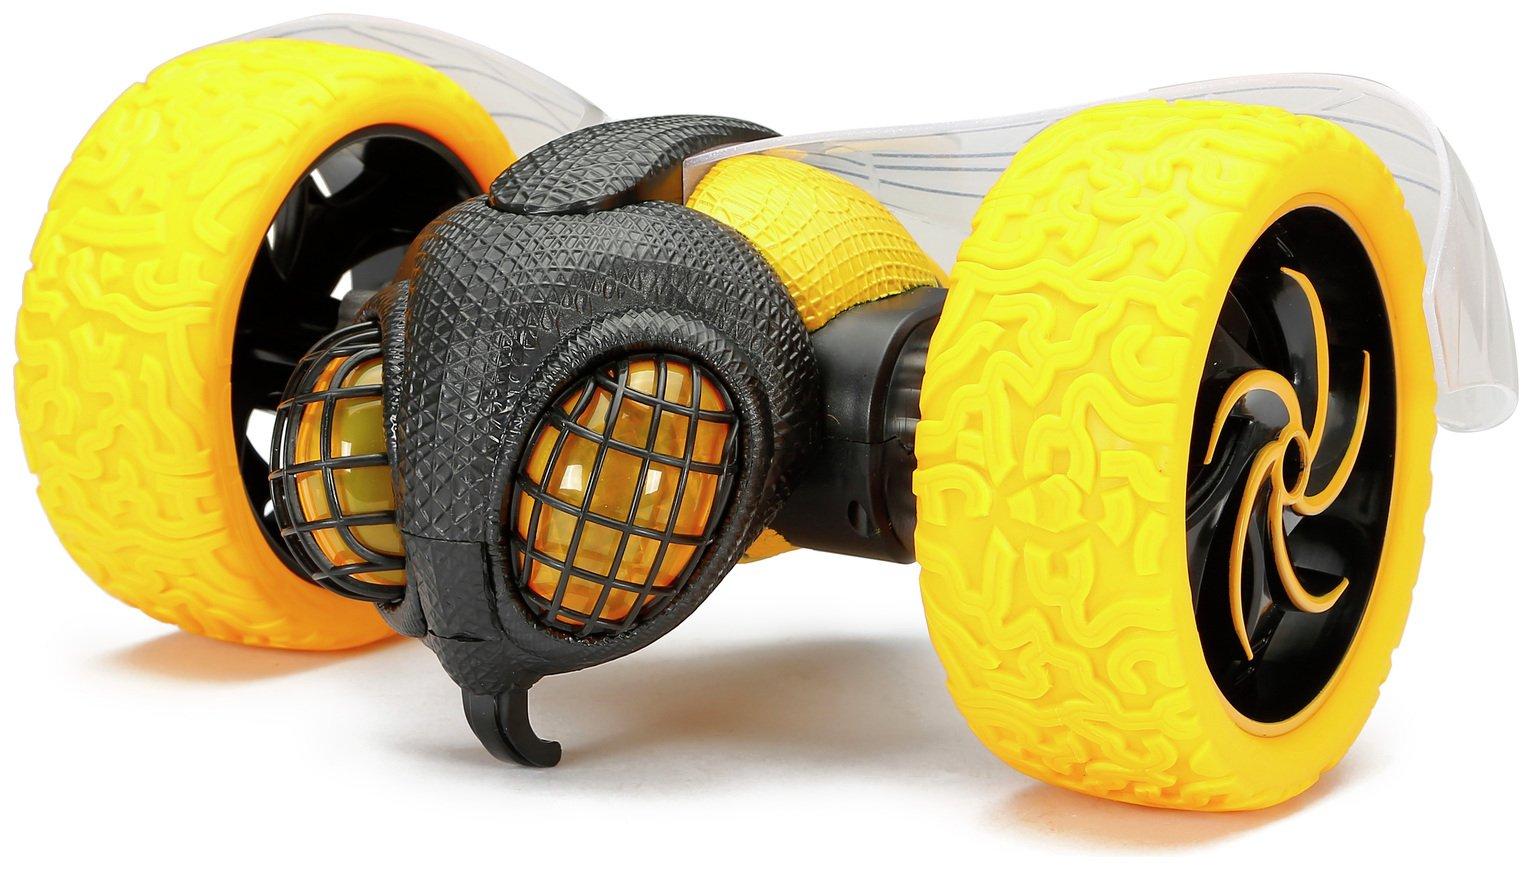 New Bright Radio Controlled Tumble Bee 10 Inch - Yellow